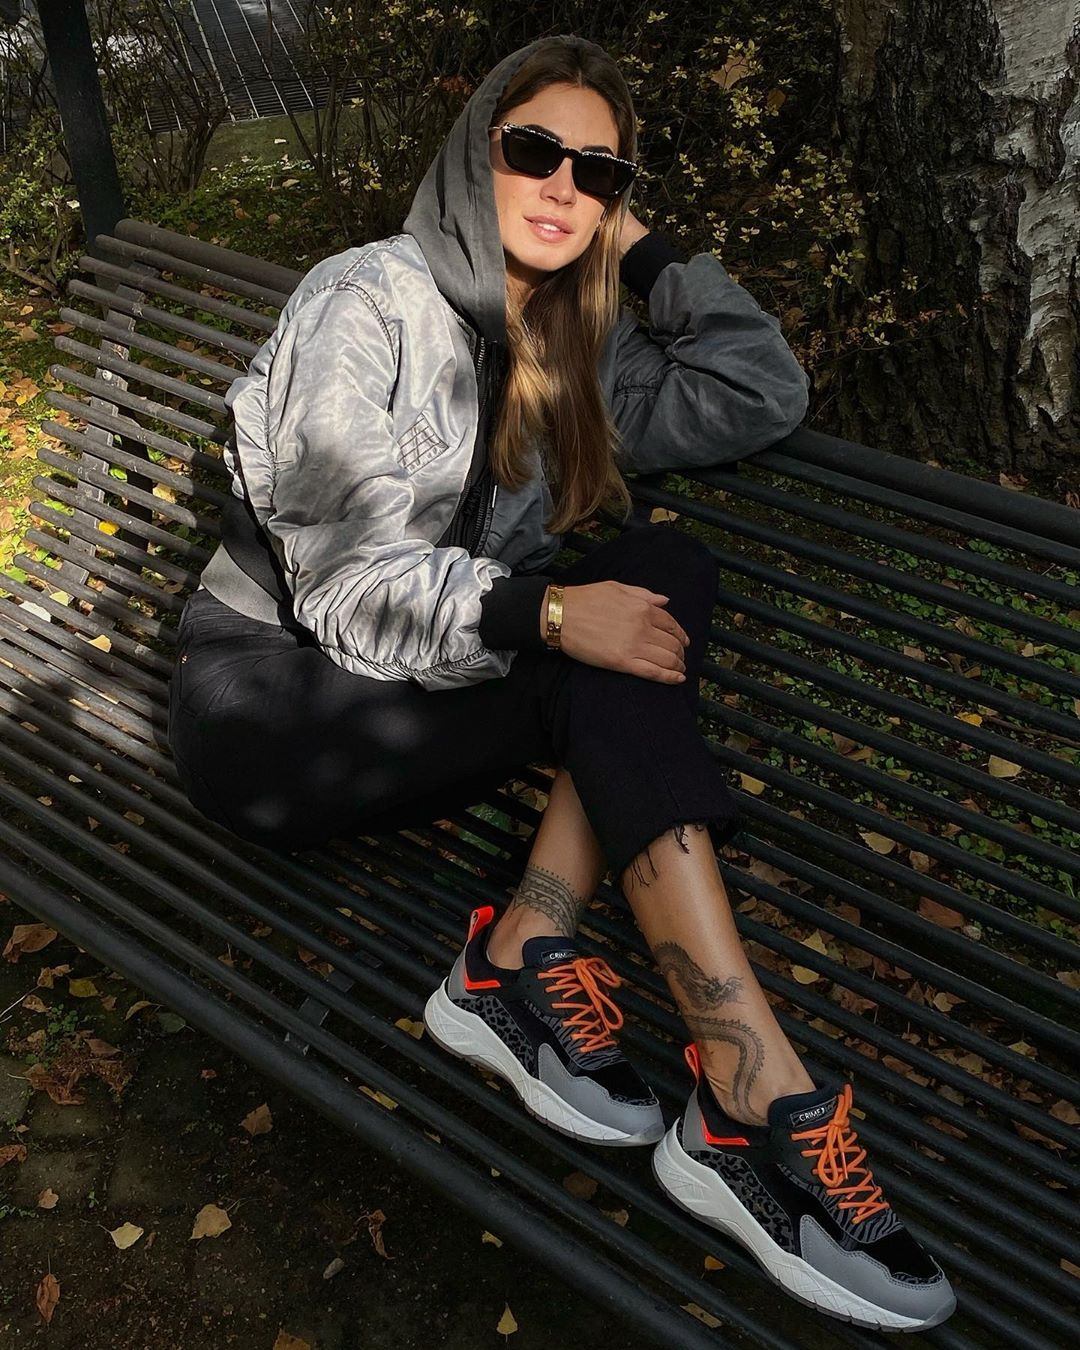 Melissa-Satta-Wallpapers-Insta-Fit-BIo-9